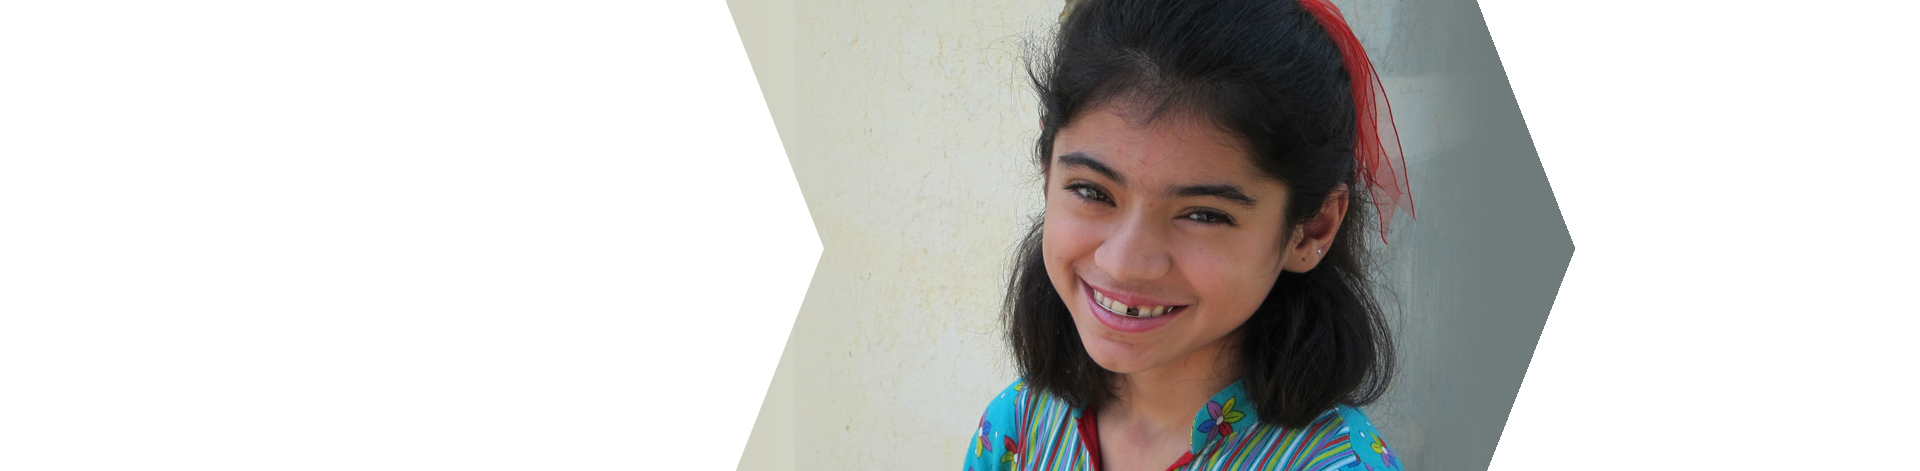 Her choice - Slider 3 - Pakistan b